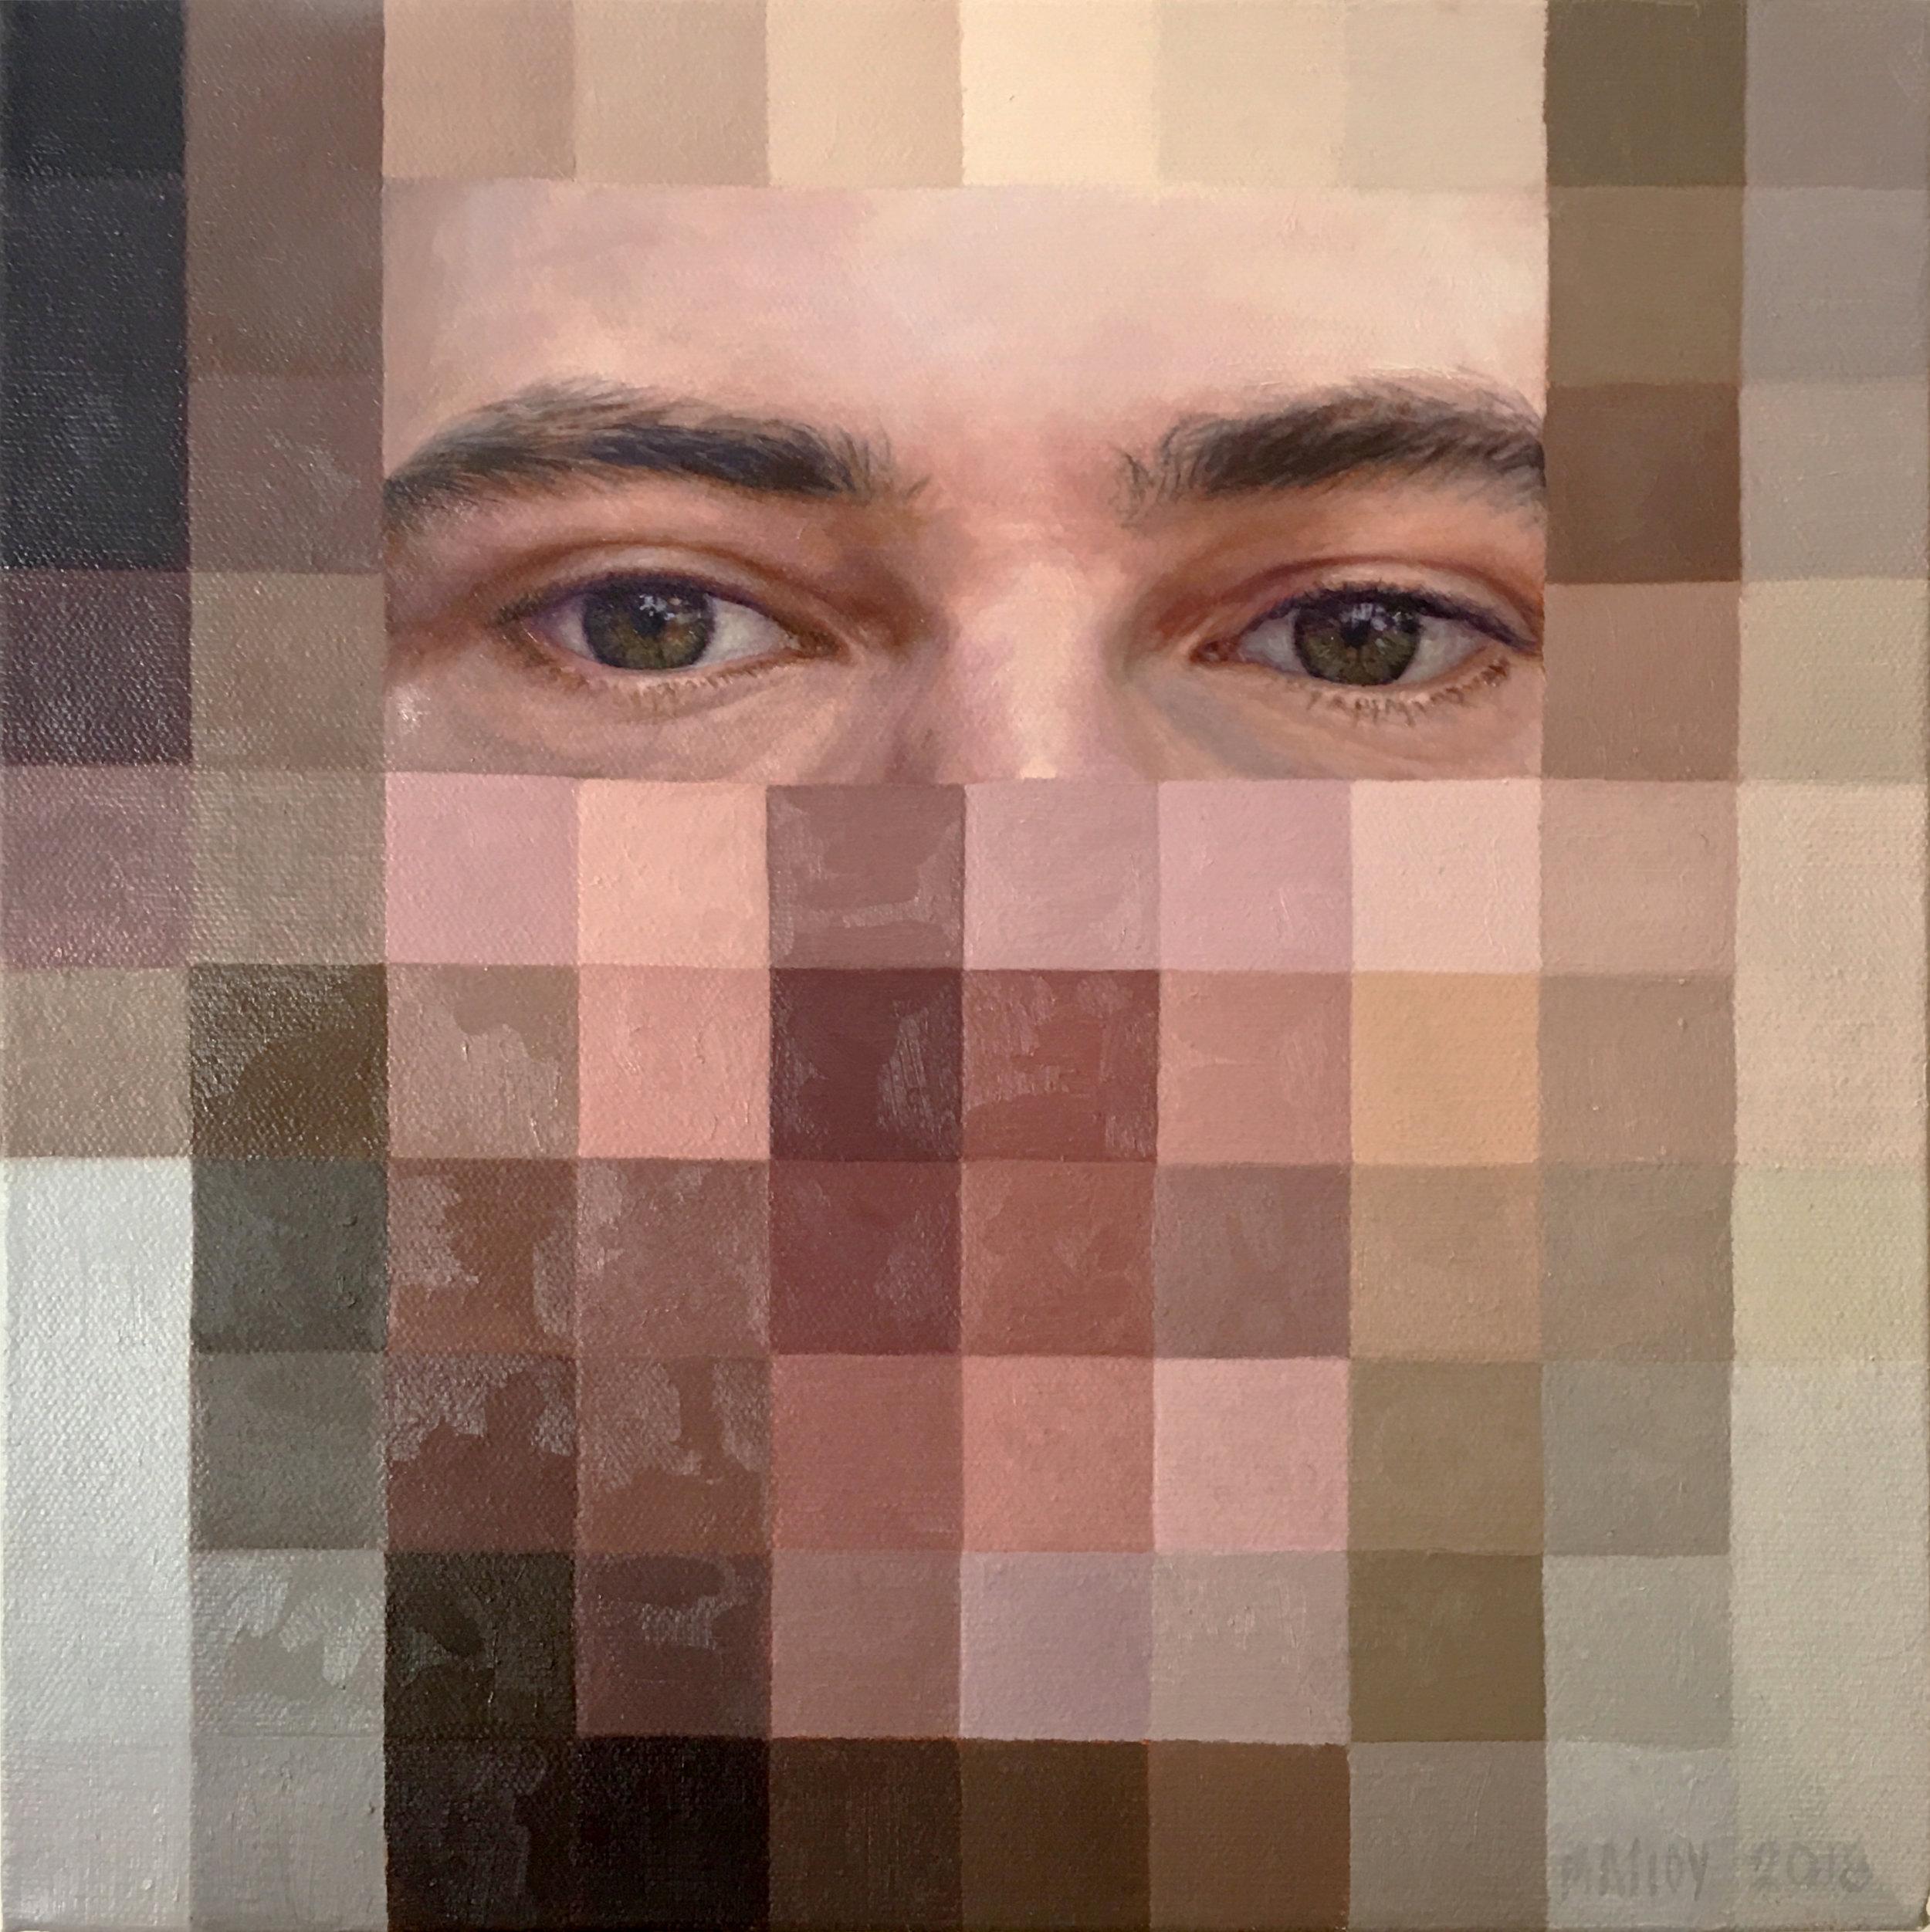 "Digital Personas:  John 12"" x 12"" oil on canvas. 2108"